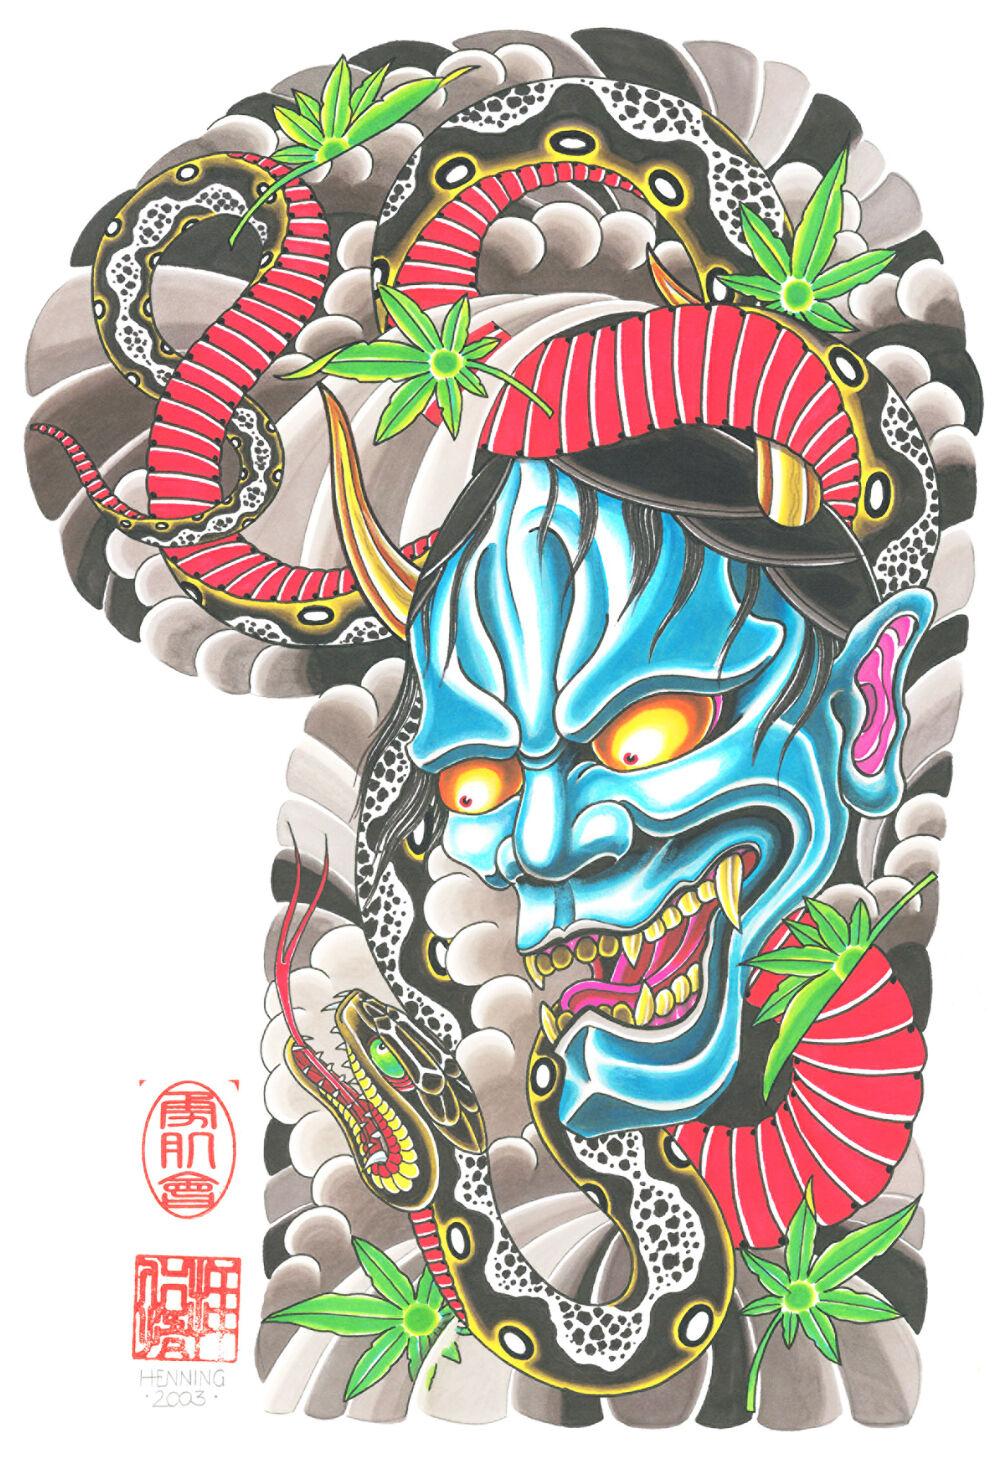 Japanese tattoo flash on dvd cd 1 100 sheets body sleeve for Japanese tattoo flash